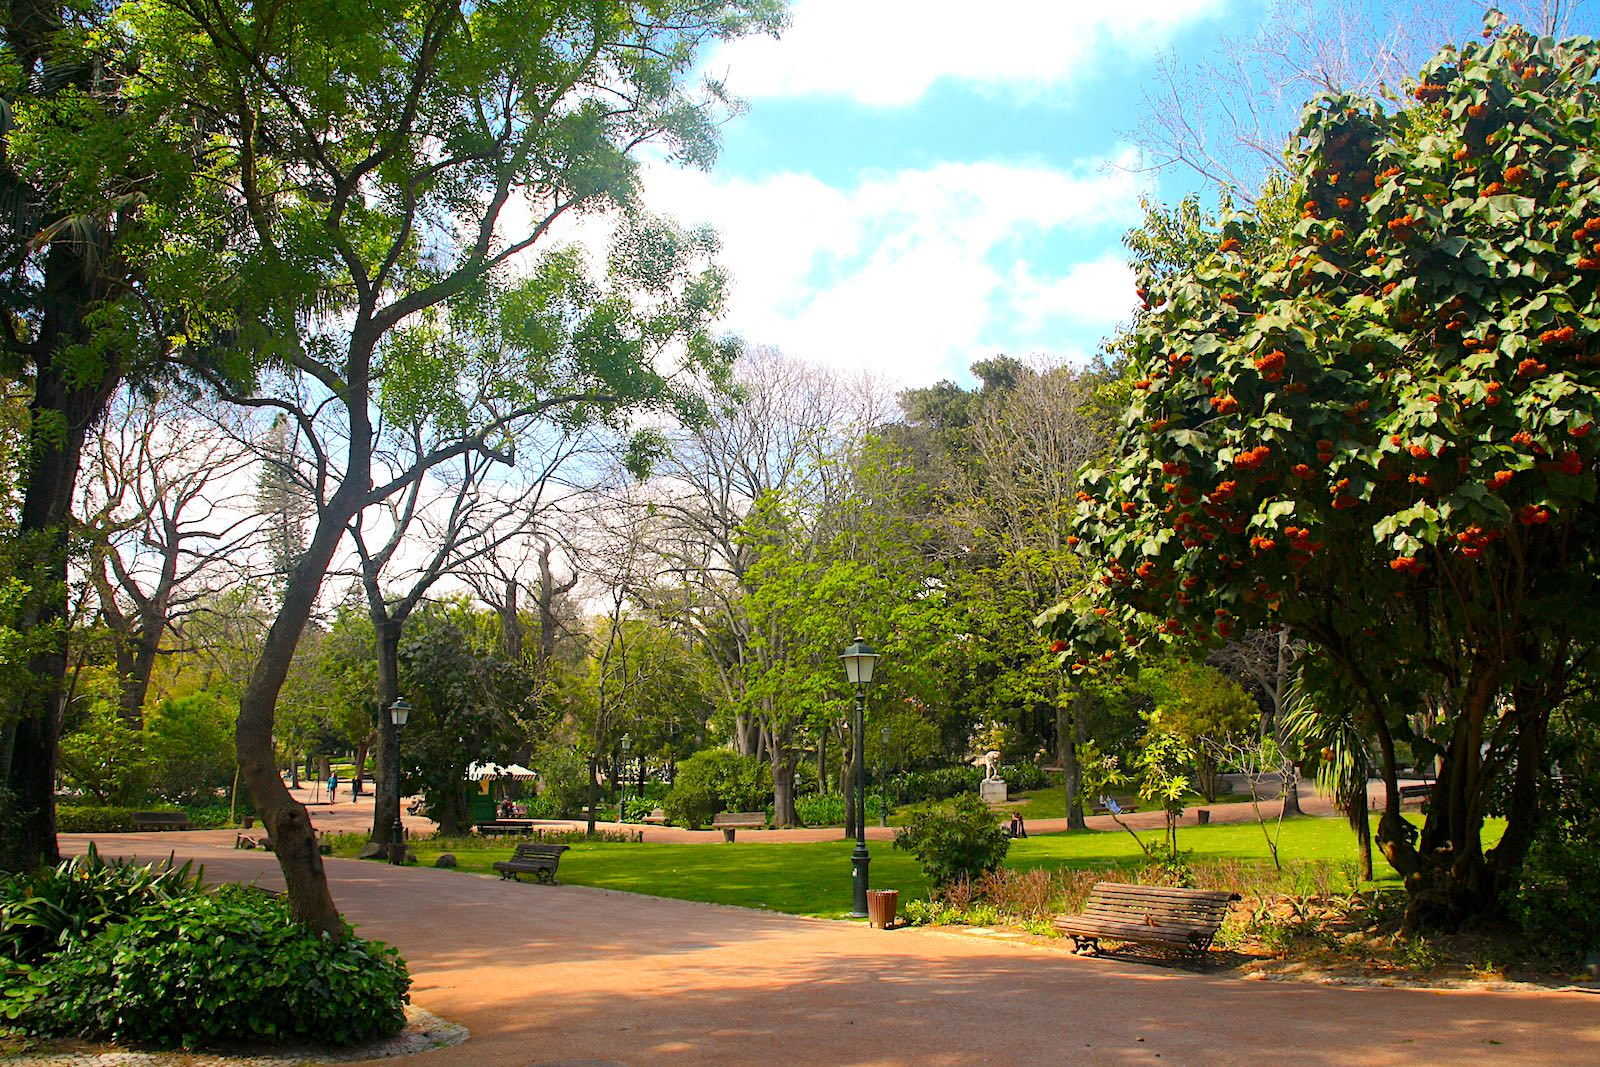 Artesanato Em Couro ~ Jardim da Estrela park voor jong en oud We u2665 ufe0f ufe0f Heart Lisbon